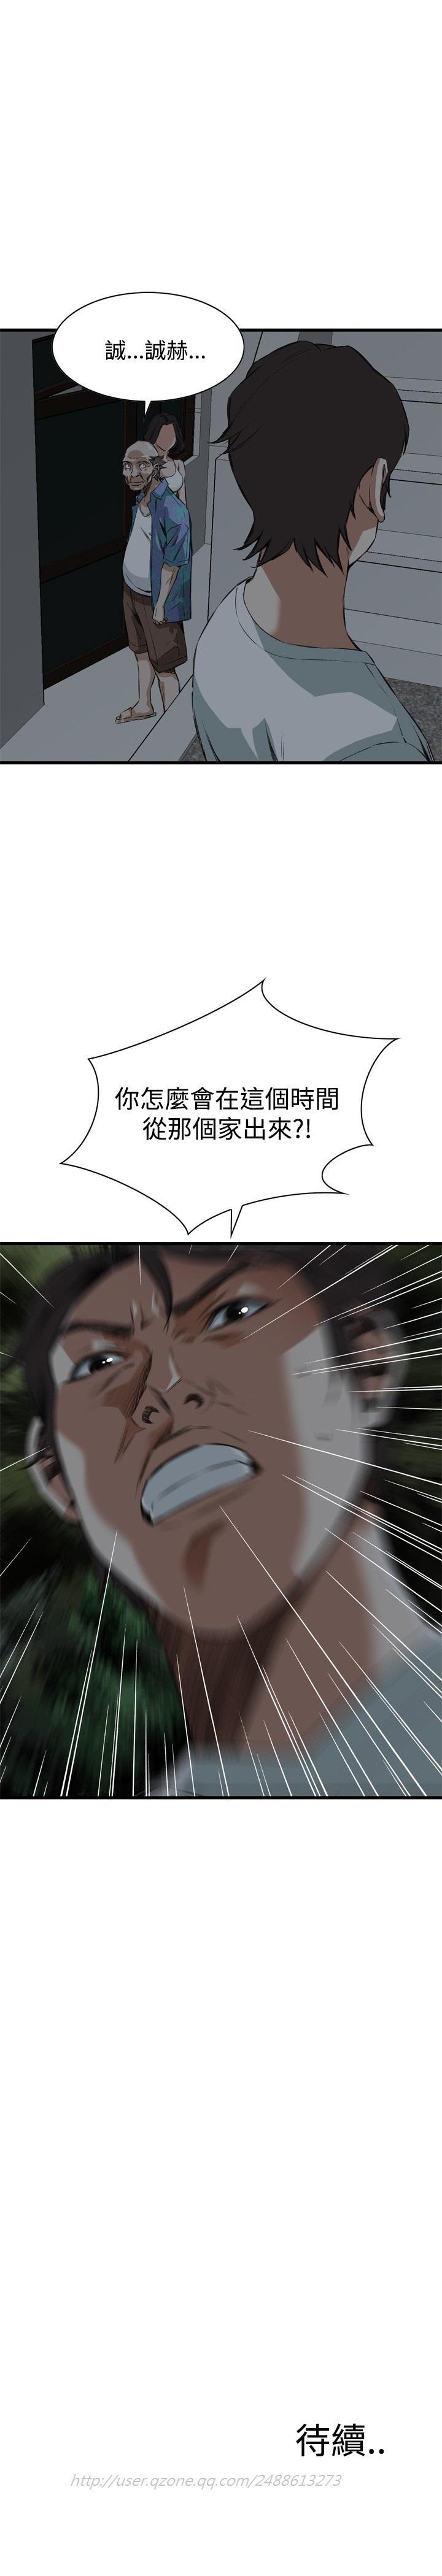 Take a Peek 偷窥 Ch.39~60 [Chinese]中文 205